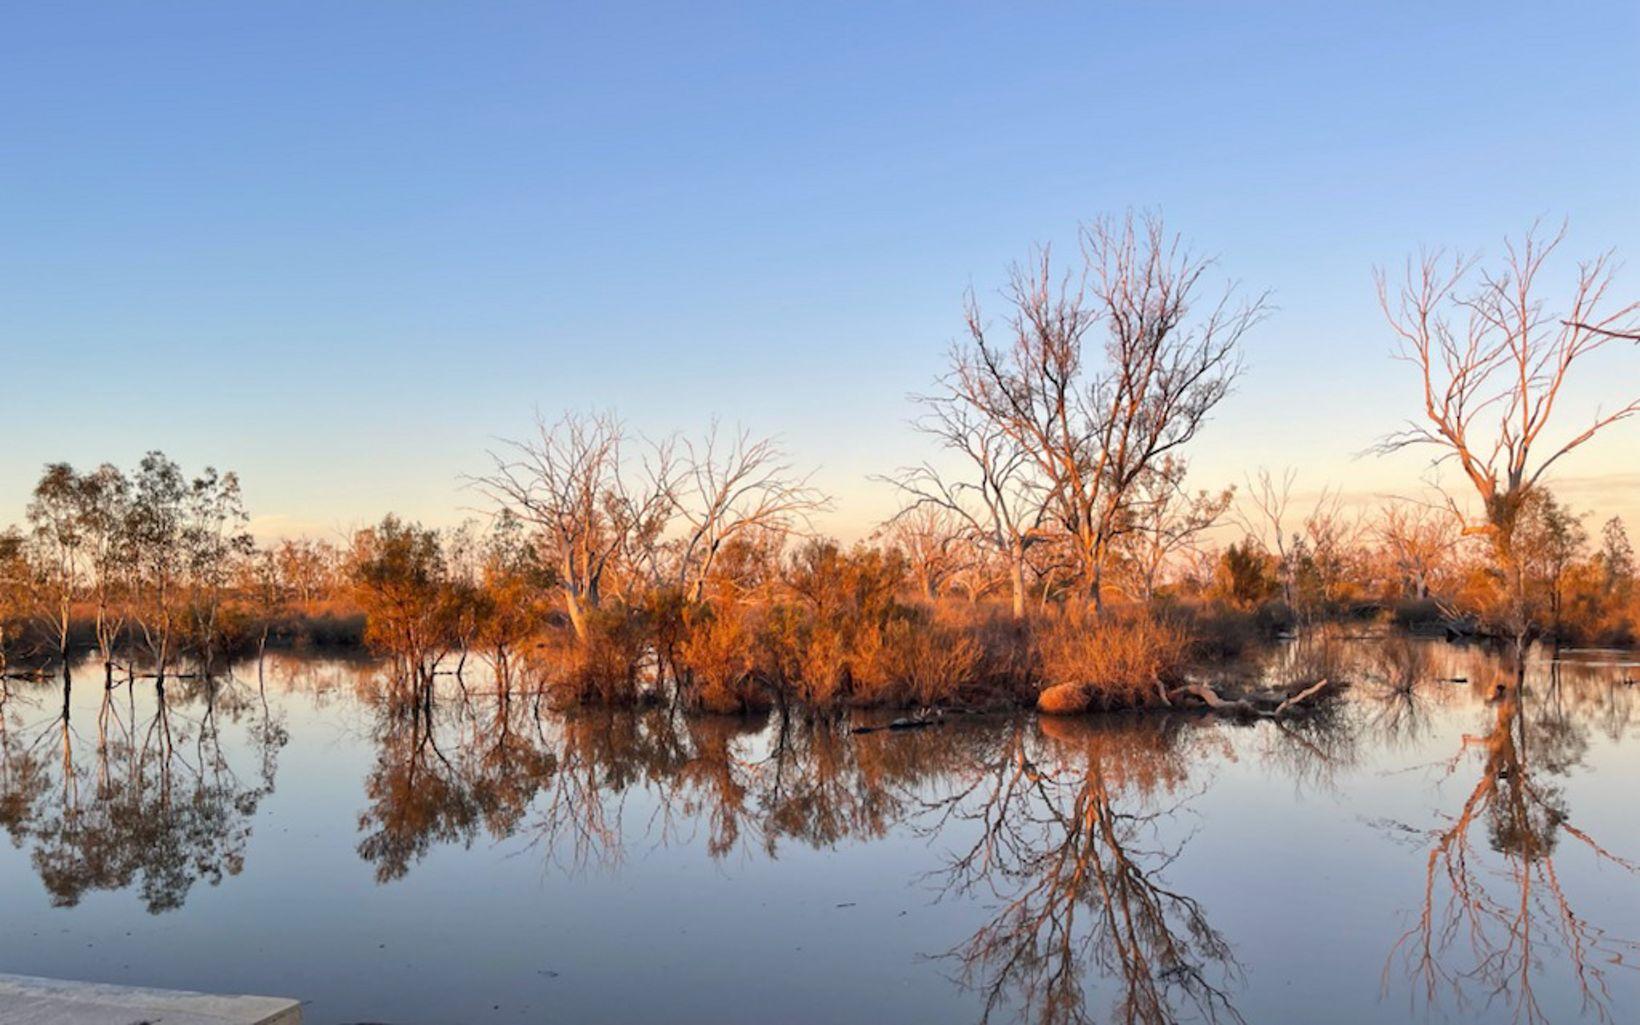 Mungery regulator rising flood water reflections